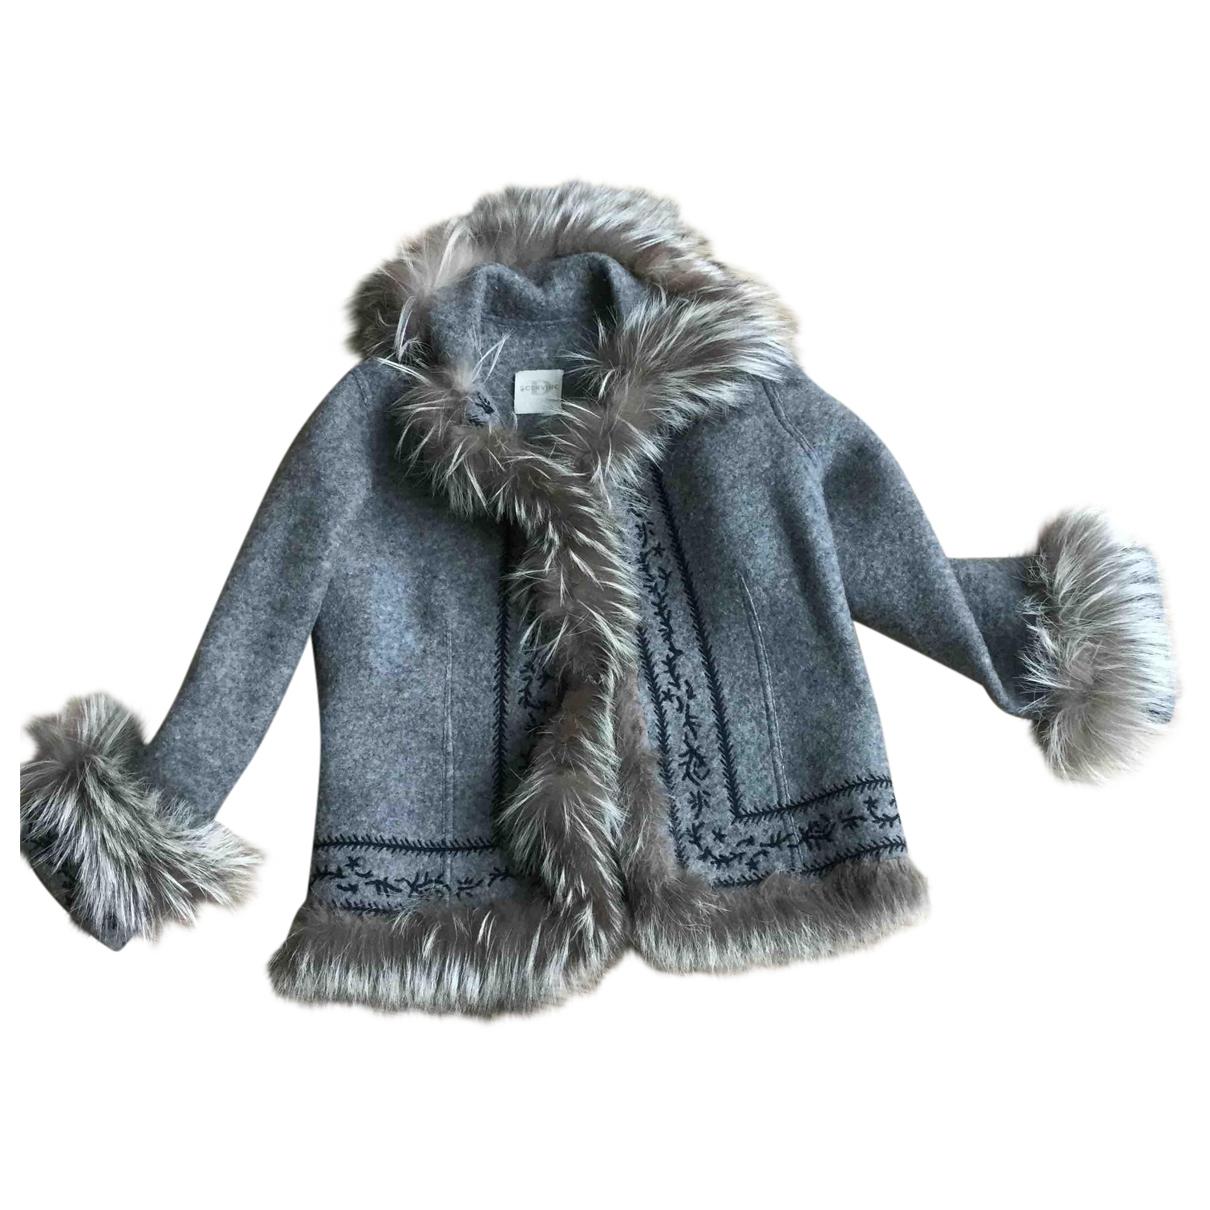 Ermanno Scervino \N Grey Wool jacket for Women 42 IT